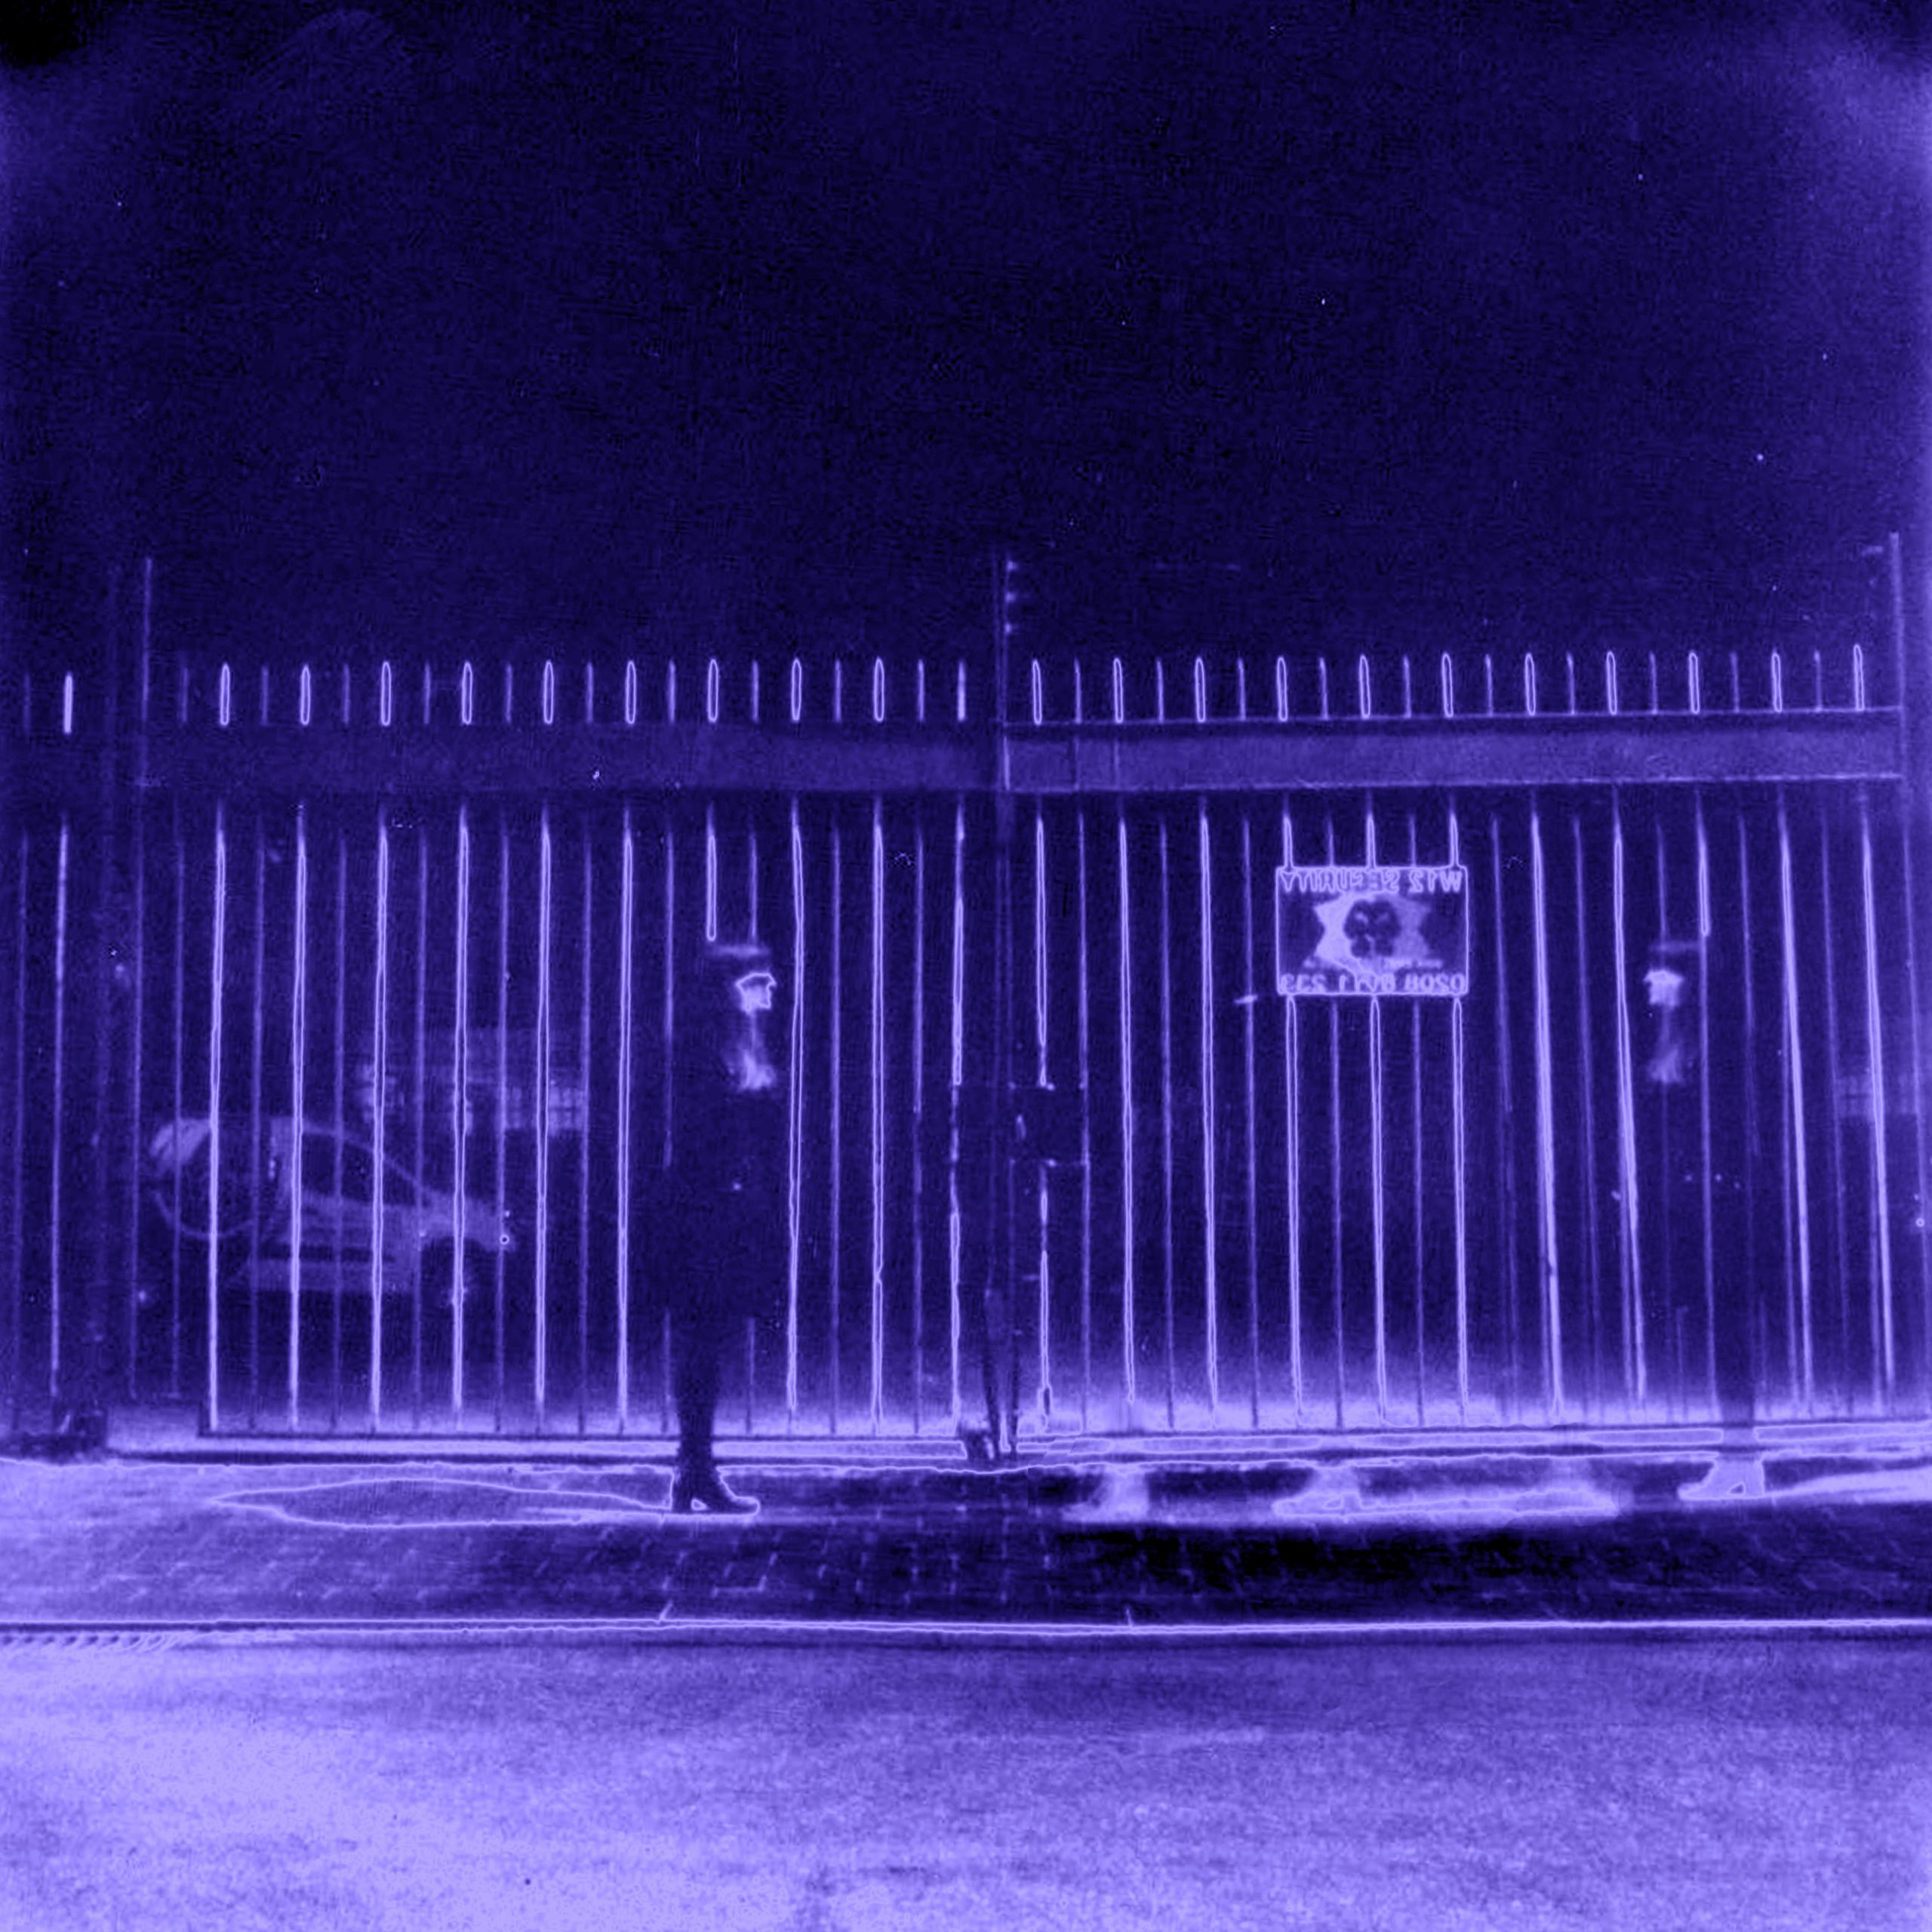 Austel - Choke - single remix cover